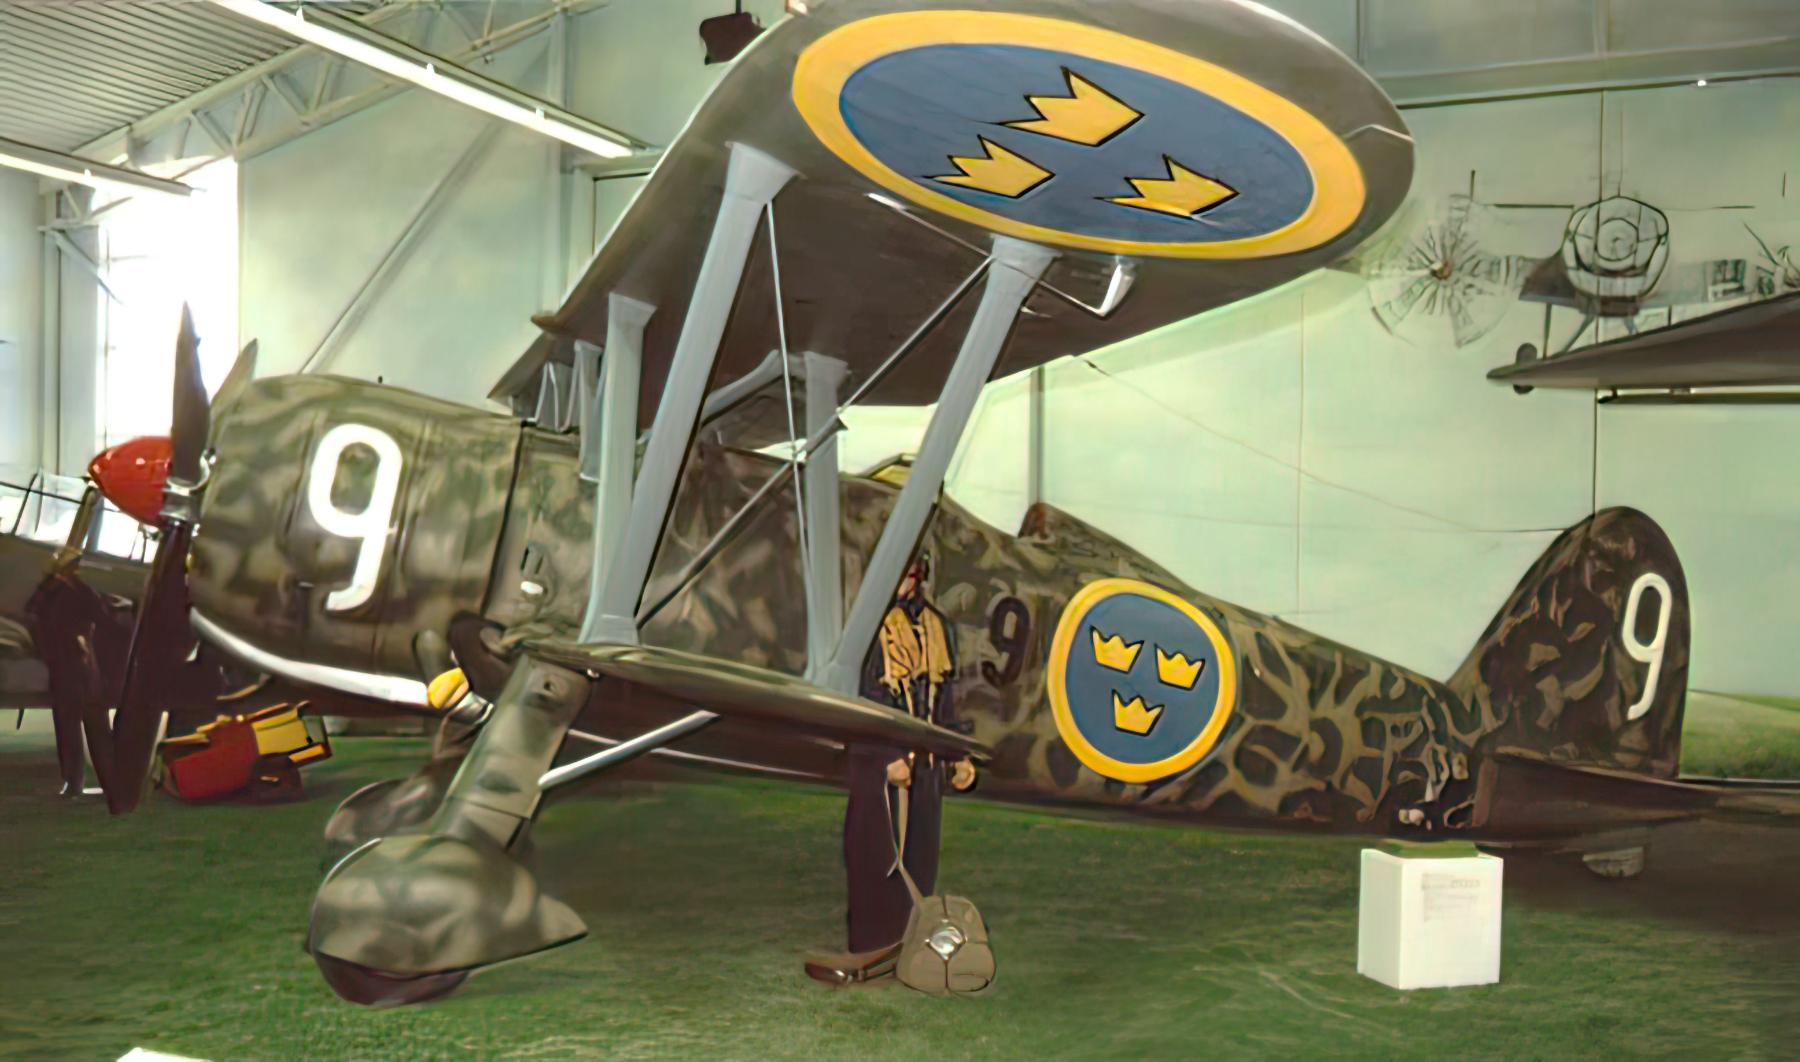 J11-Fiat-CR-42-Falco-RSWAF-F9.1Sqn-White-9-Sweden-1941-01.jpg